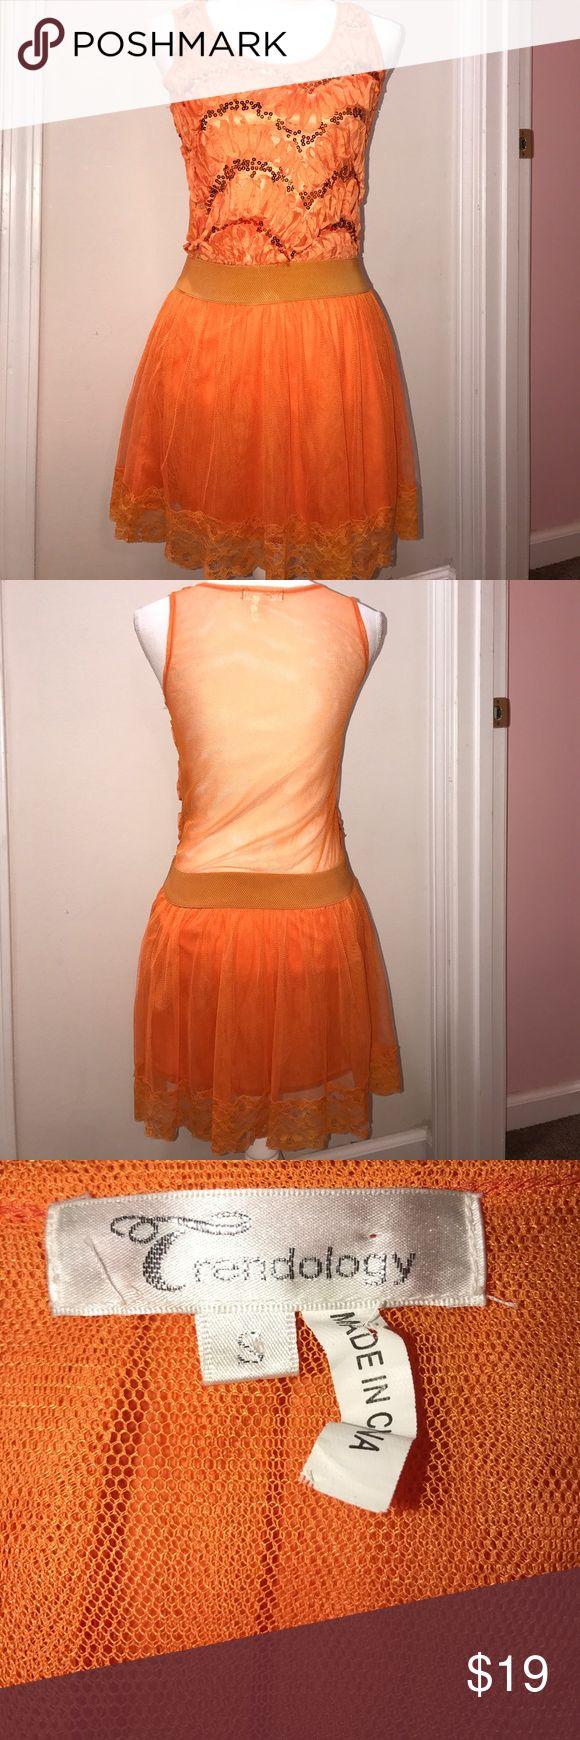 Trendology Orange Sequin Dress Size Small Size Small Trendology Dresses